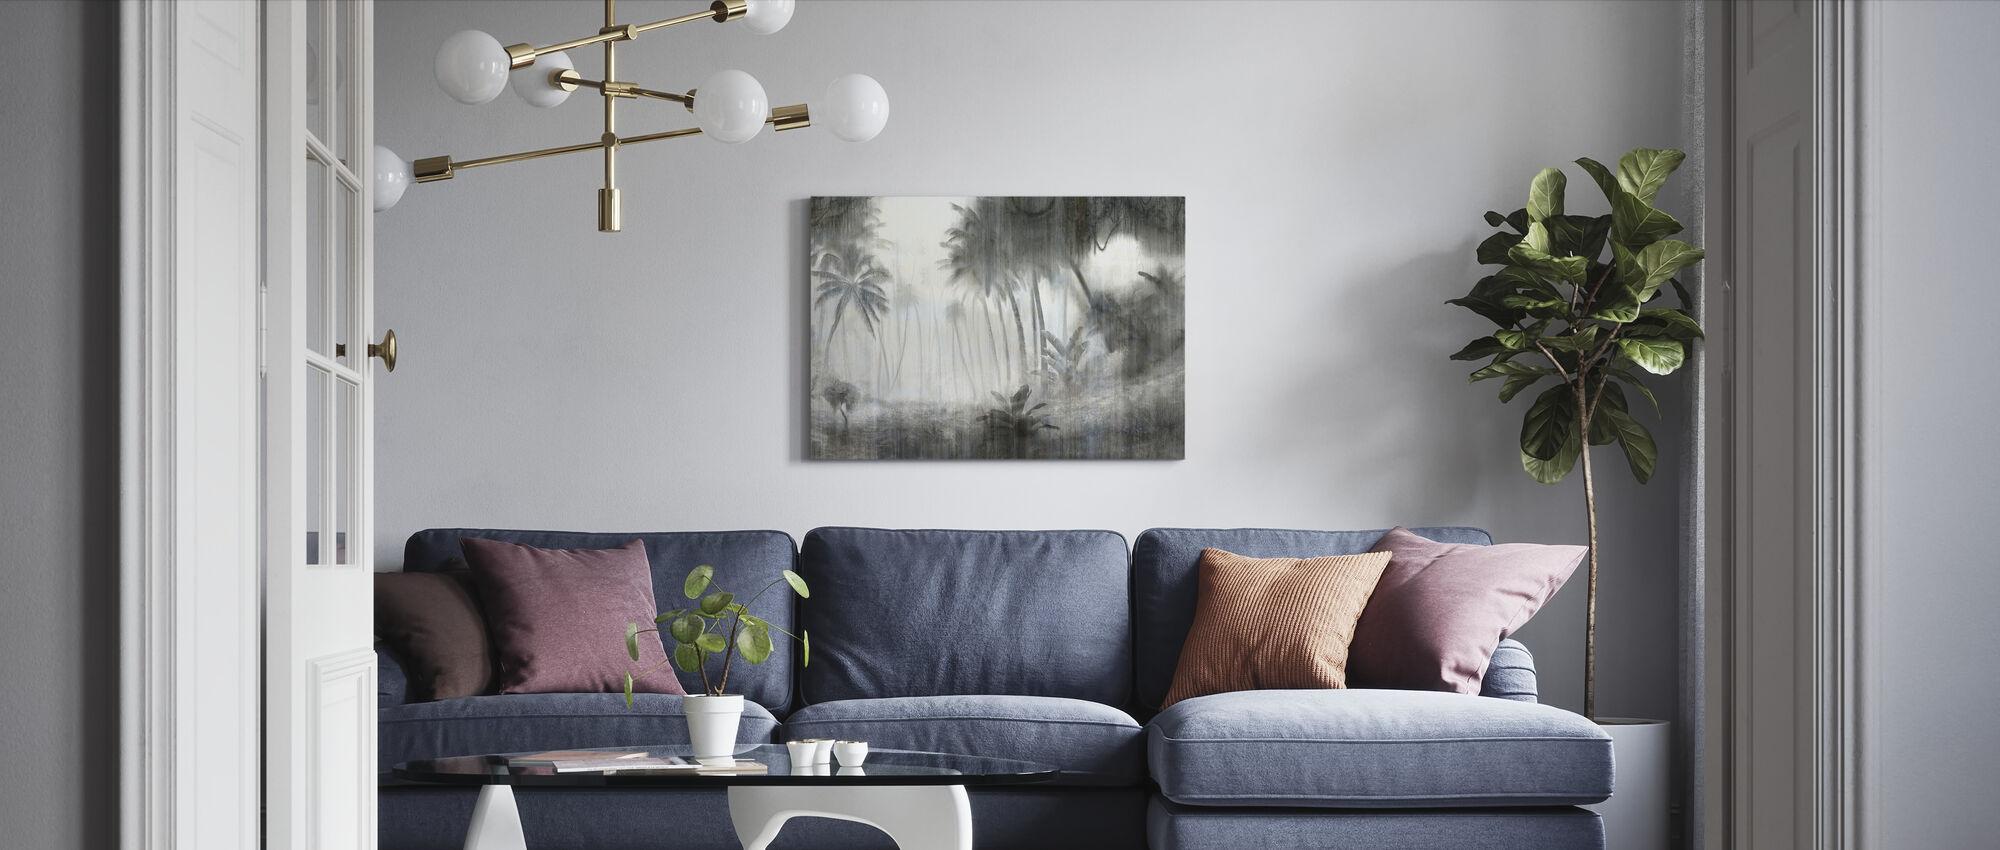 Definitiv tropisk - ljus - Canvastavla - Vardagsrum